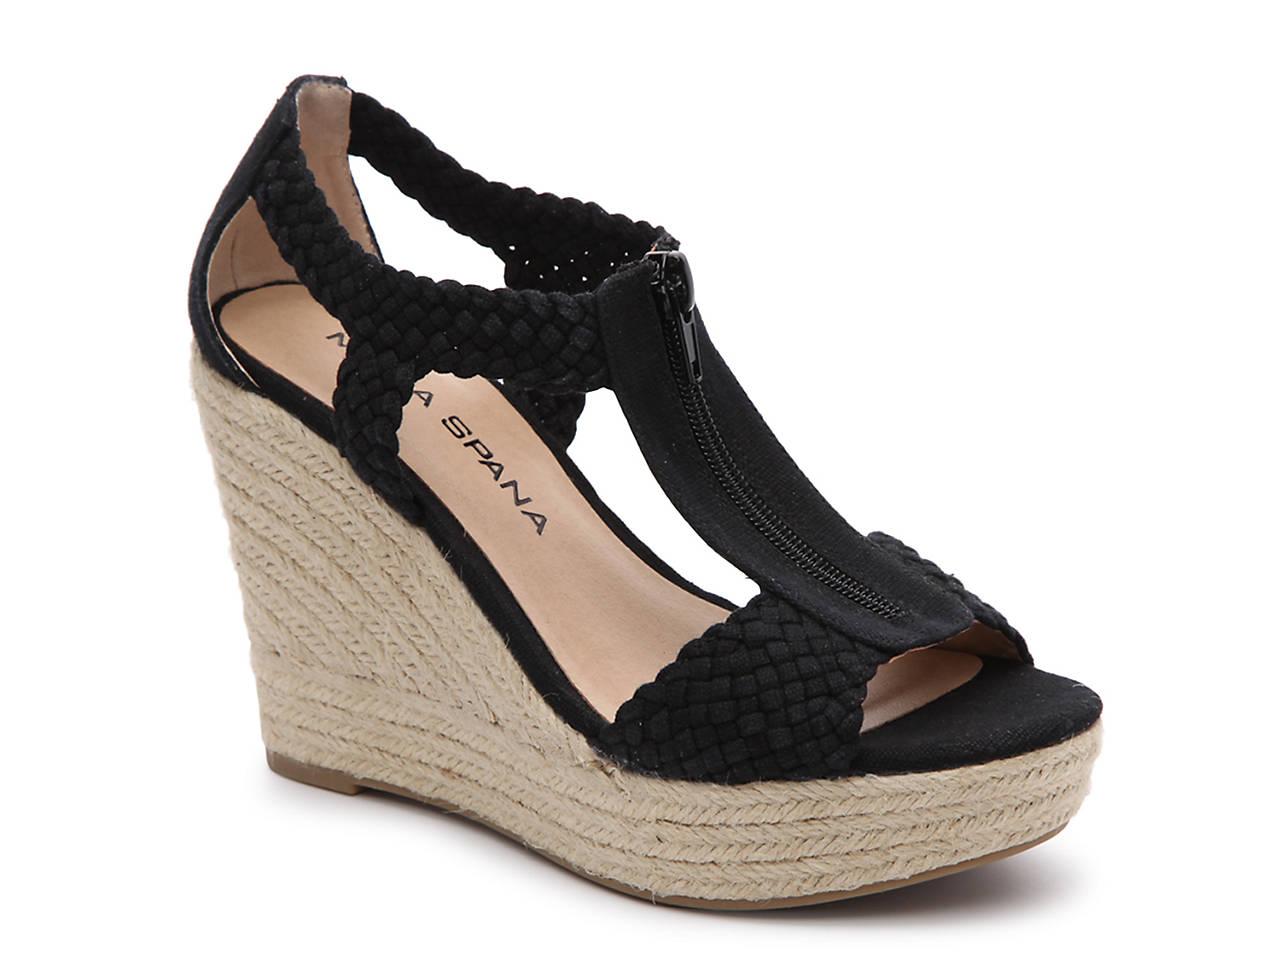 0010717e9ef1 Moda Spana Whitney Wedge Sandal Women s Shoes